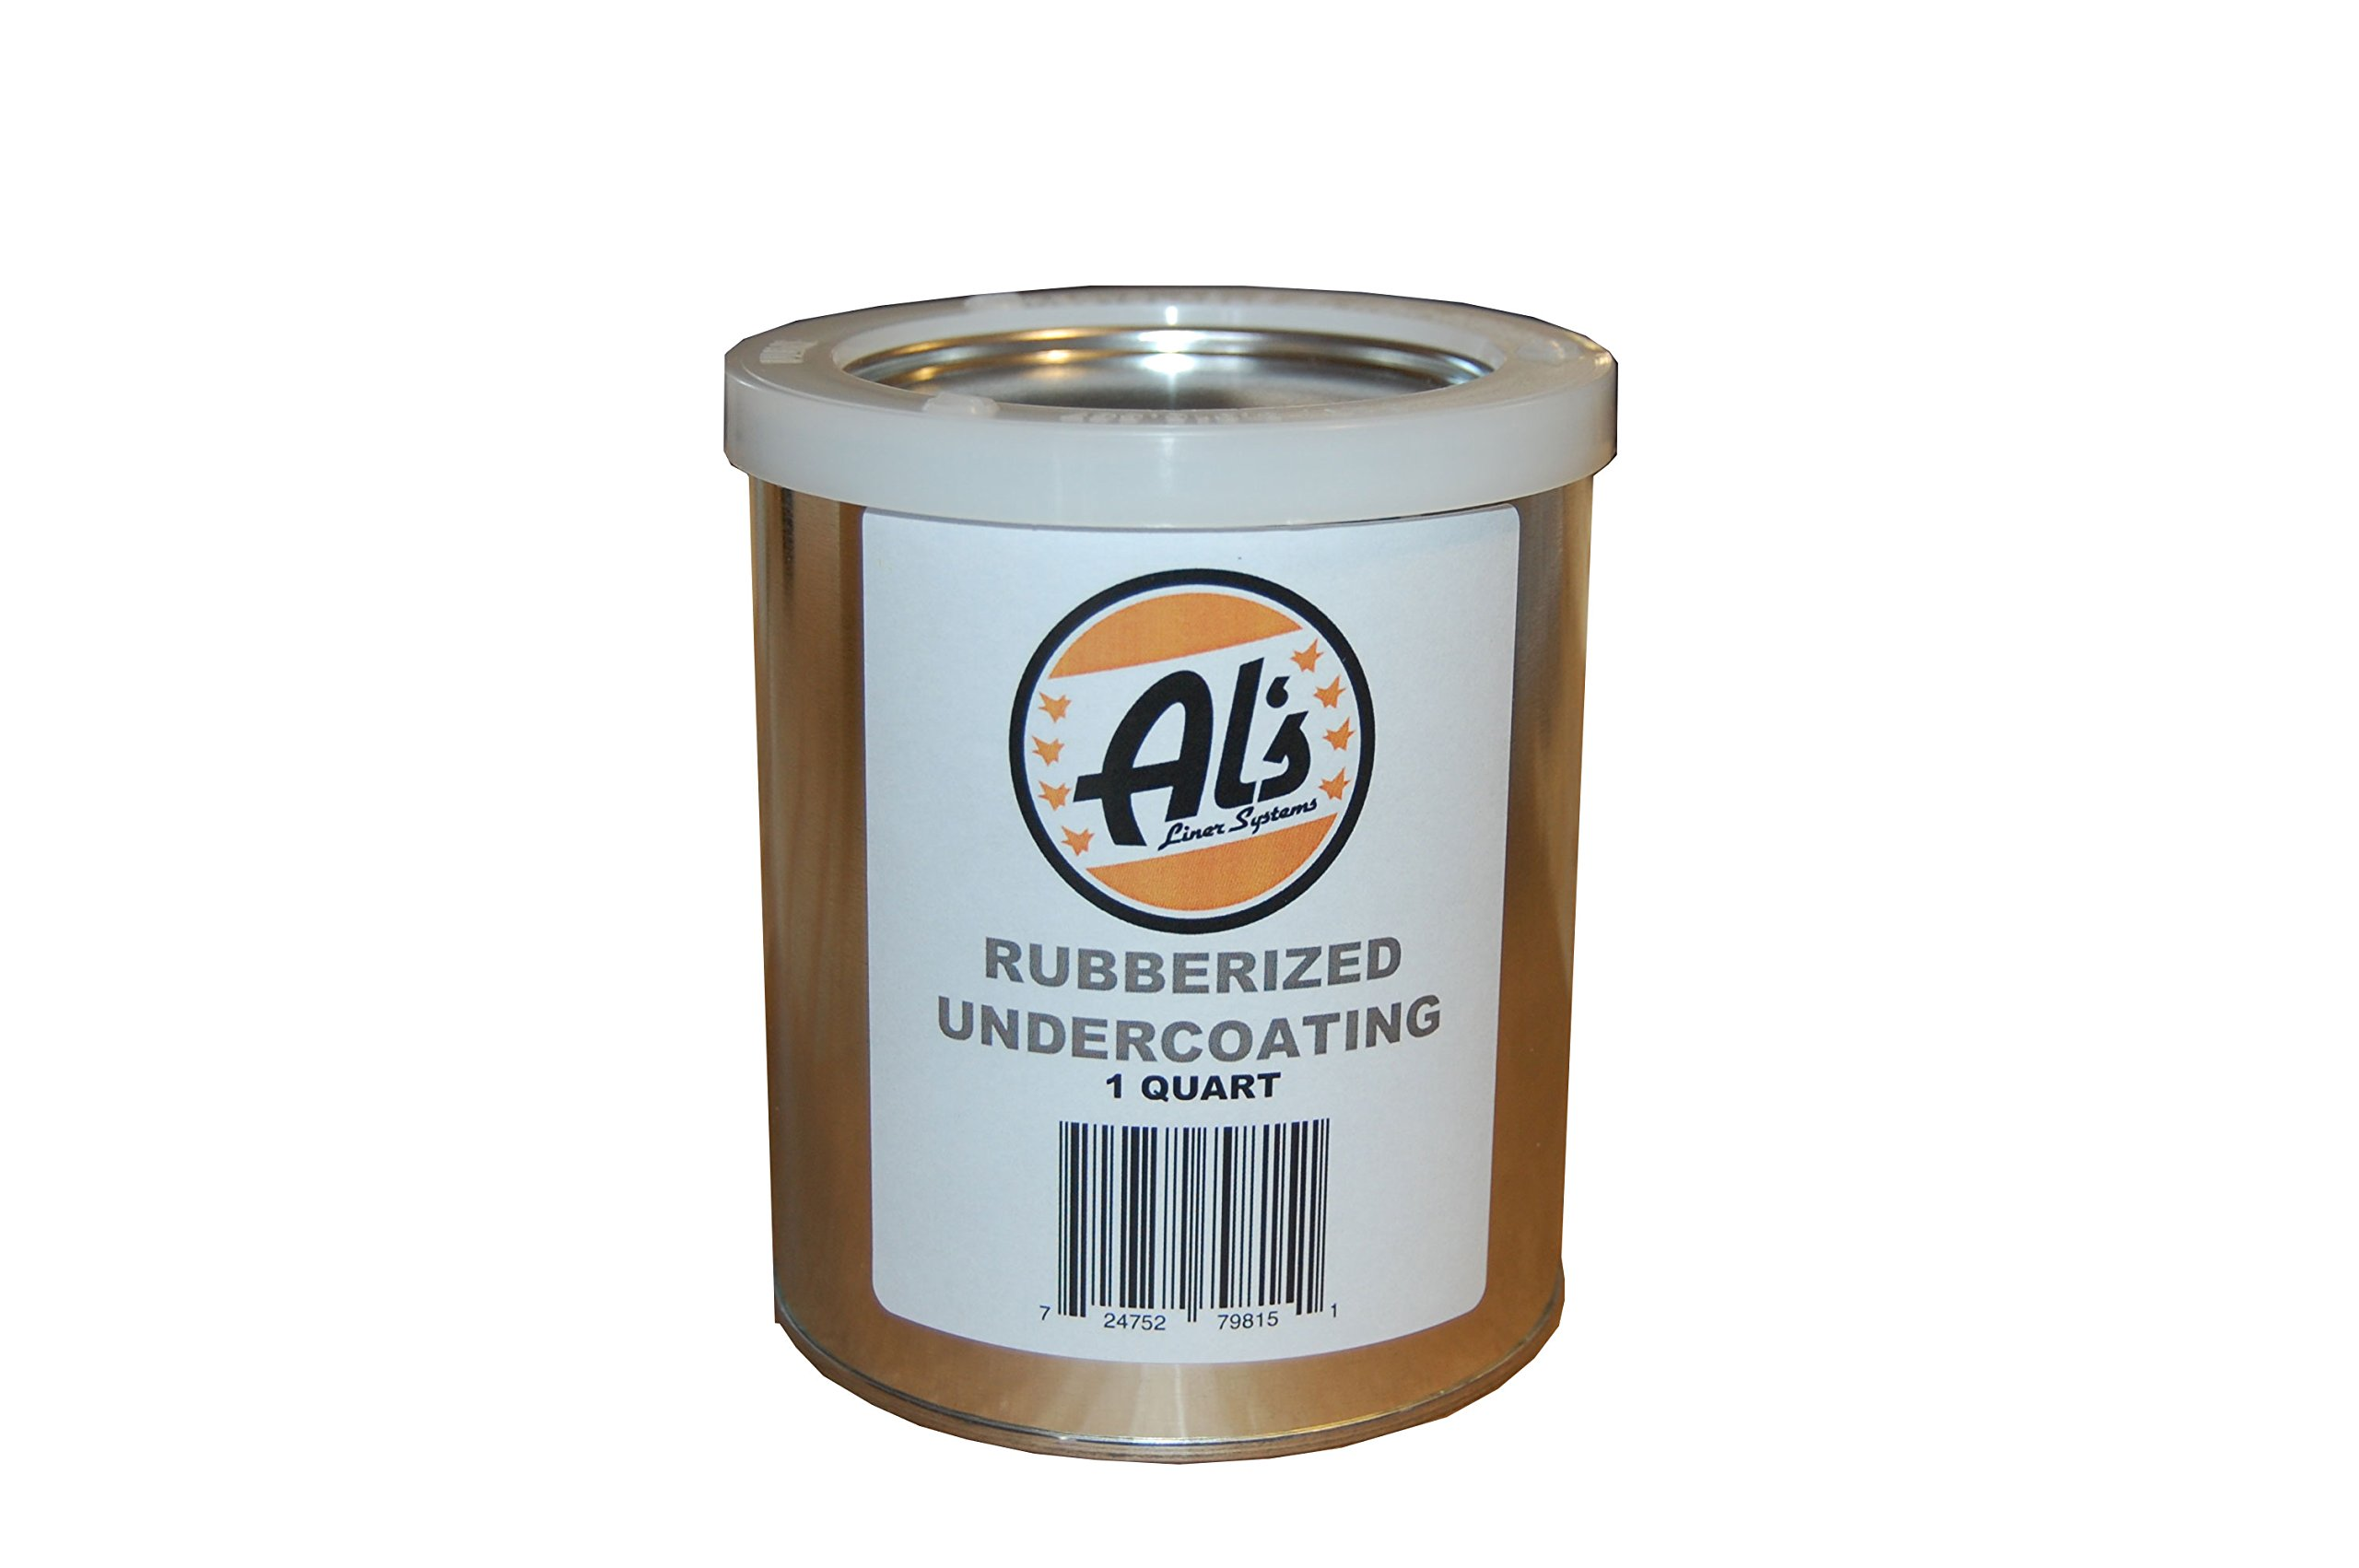 Al's Liner ALS-UCR Premium DIY Rubberized Undercoating, Quart, Black, 32. Fluid_Ounces